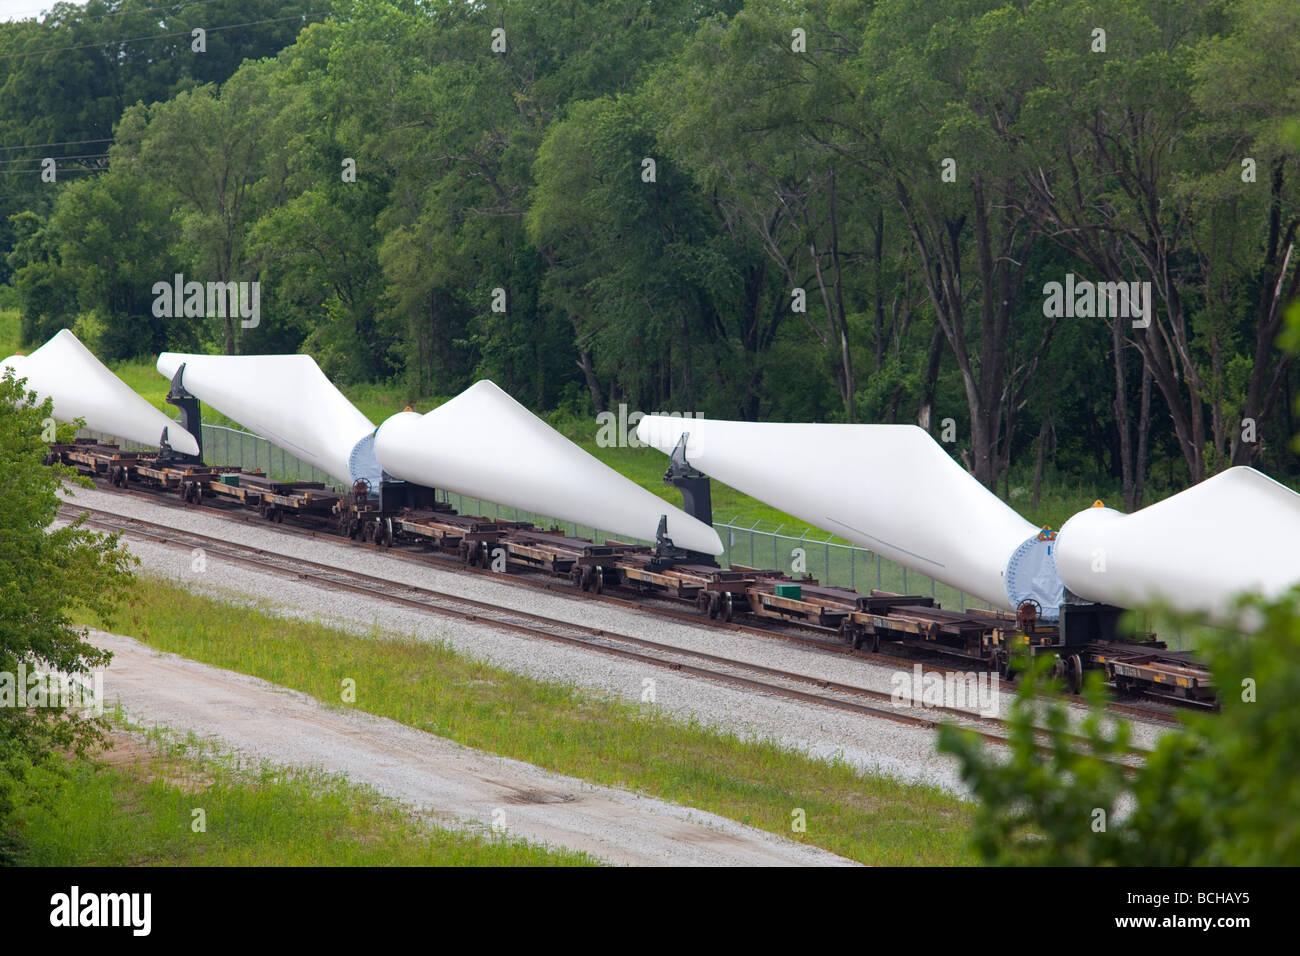 Fort Madison Iowa Wind turbine blades at the Siemens Energy Fort Madison Blade Plant - Stock Image